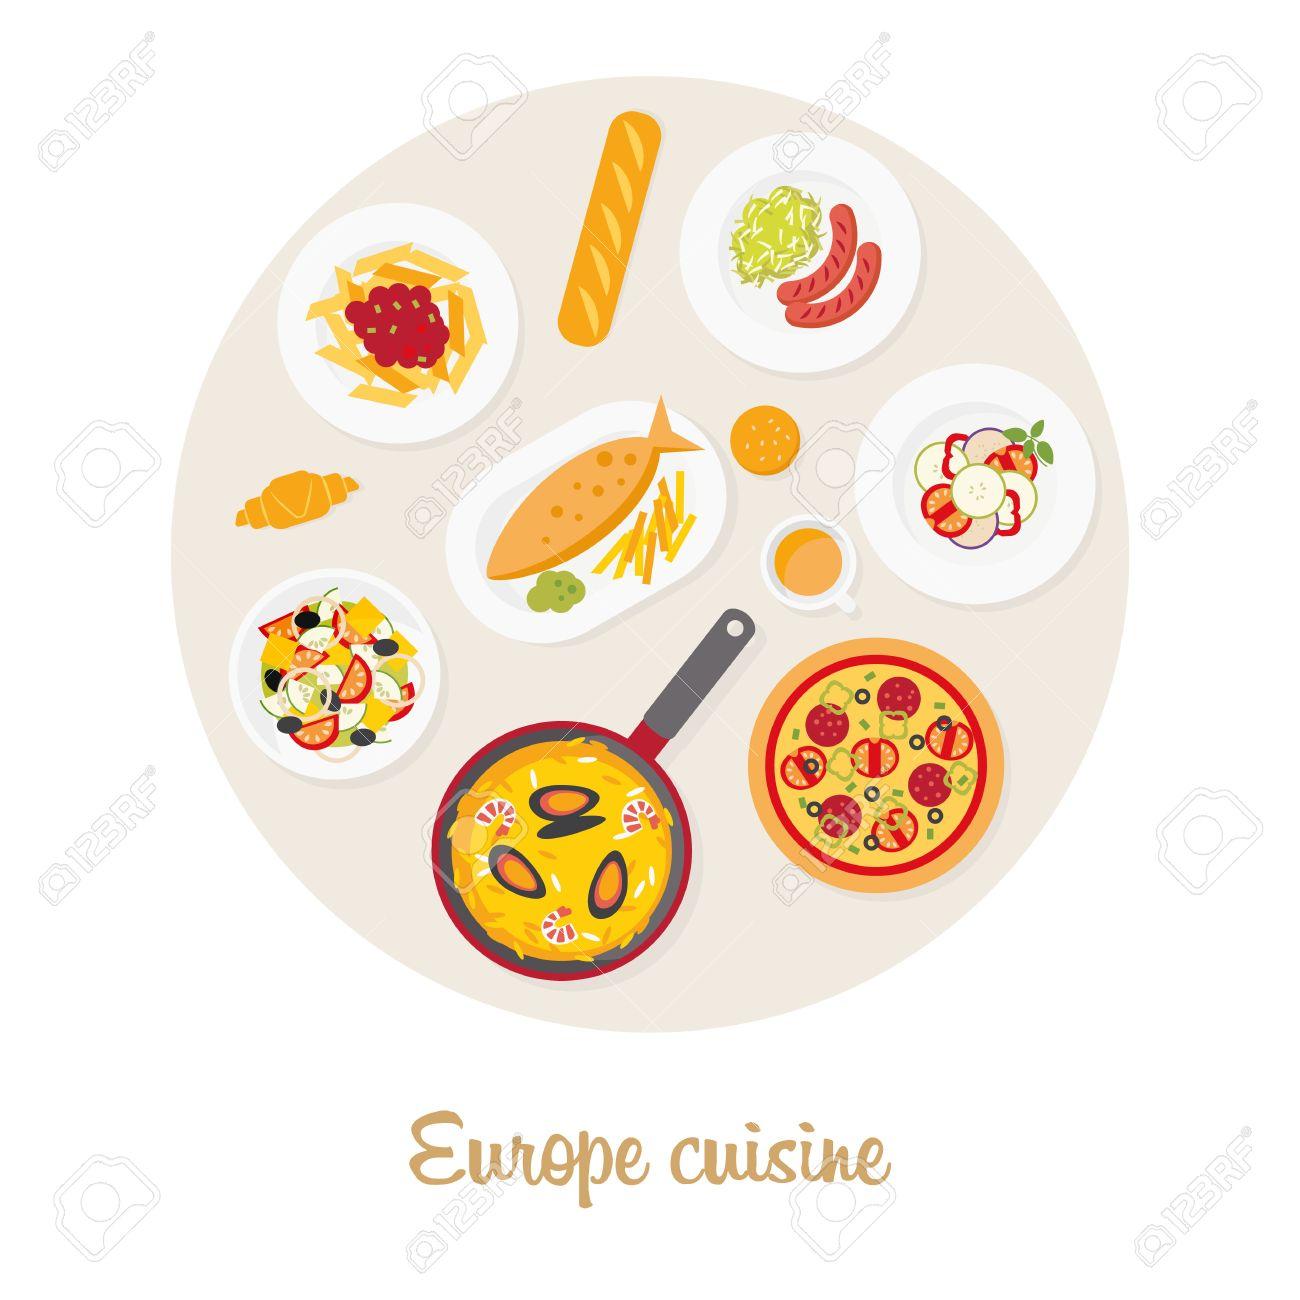 Europaische Kuche Europaische Lebensmittel Satz Italienisch